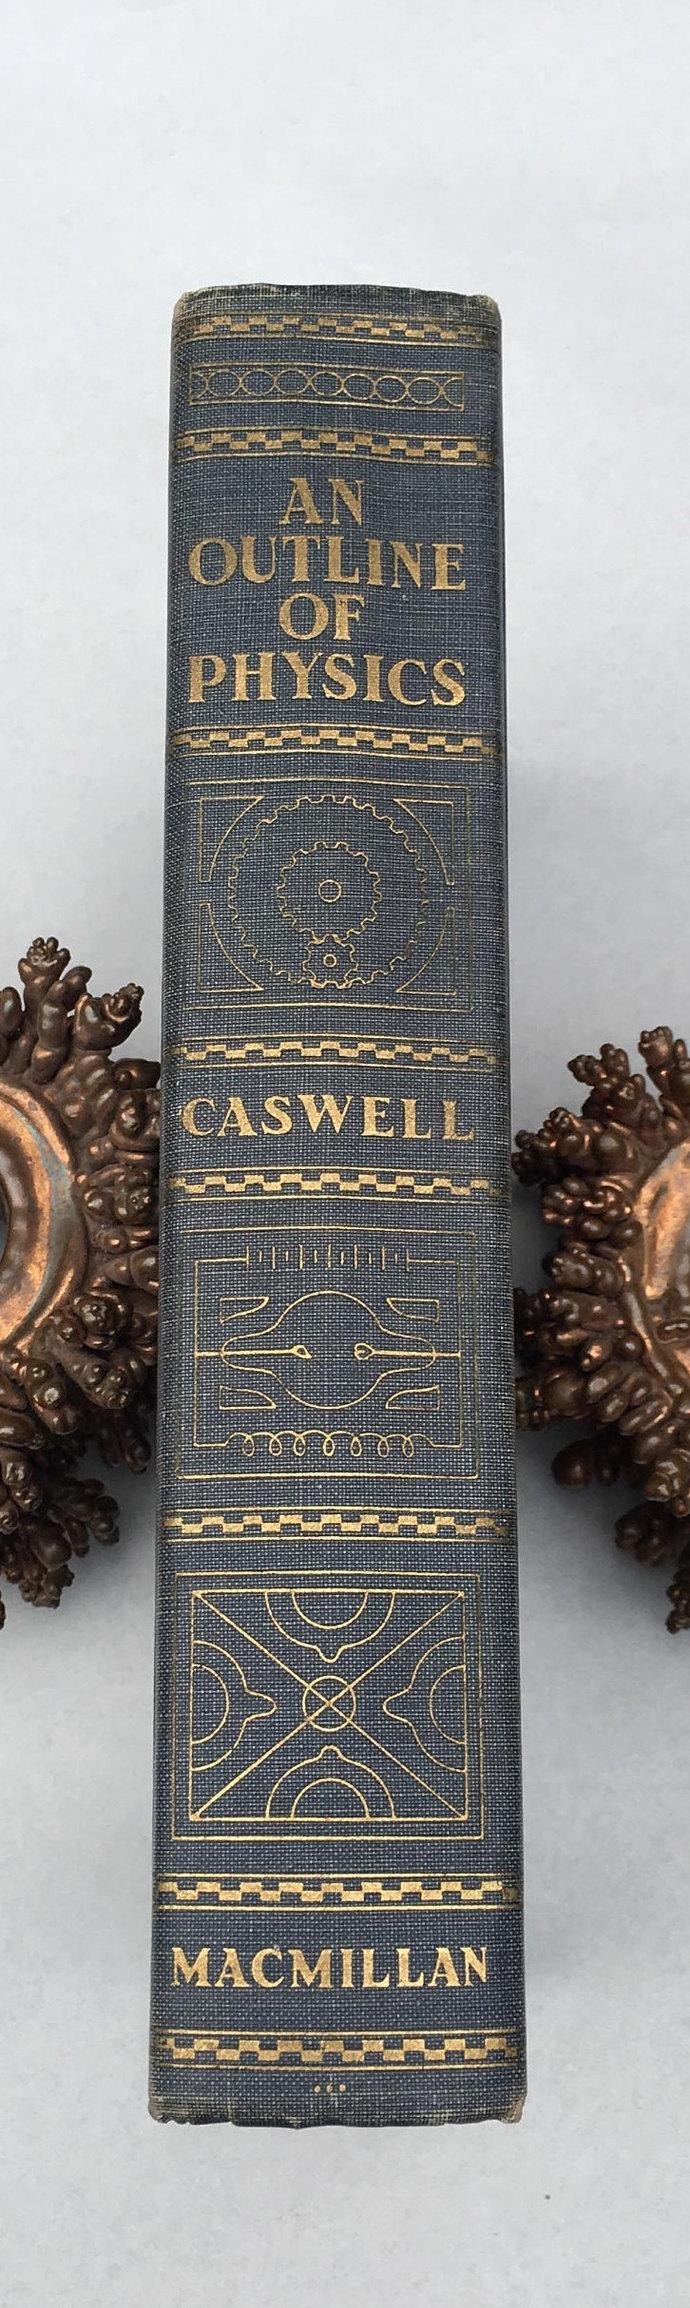 An Outline of Physics 1938 Book Albert Edward Caswell